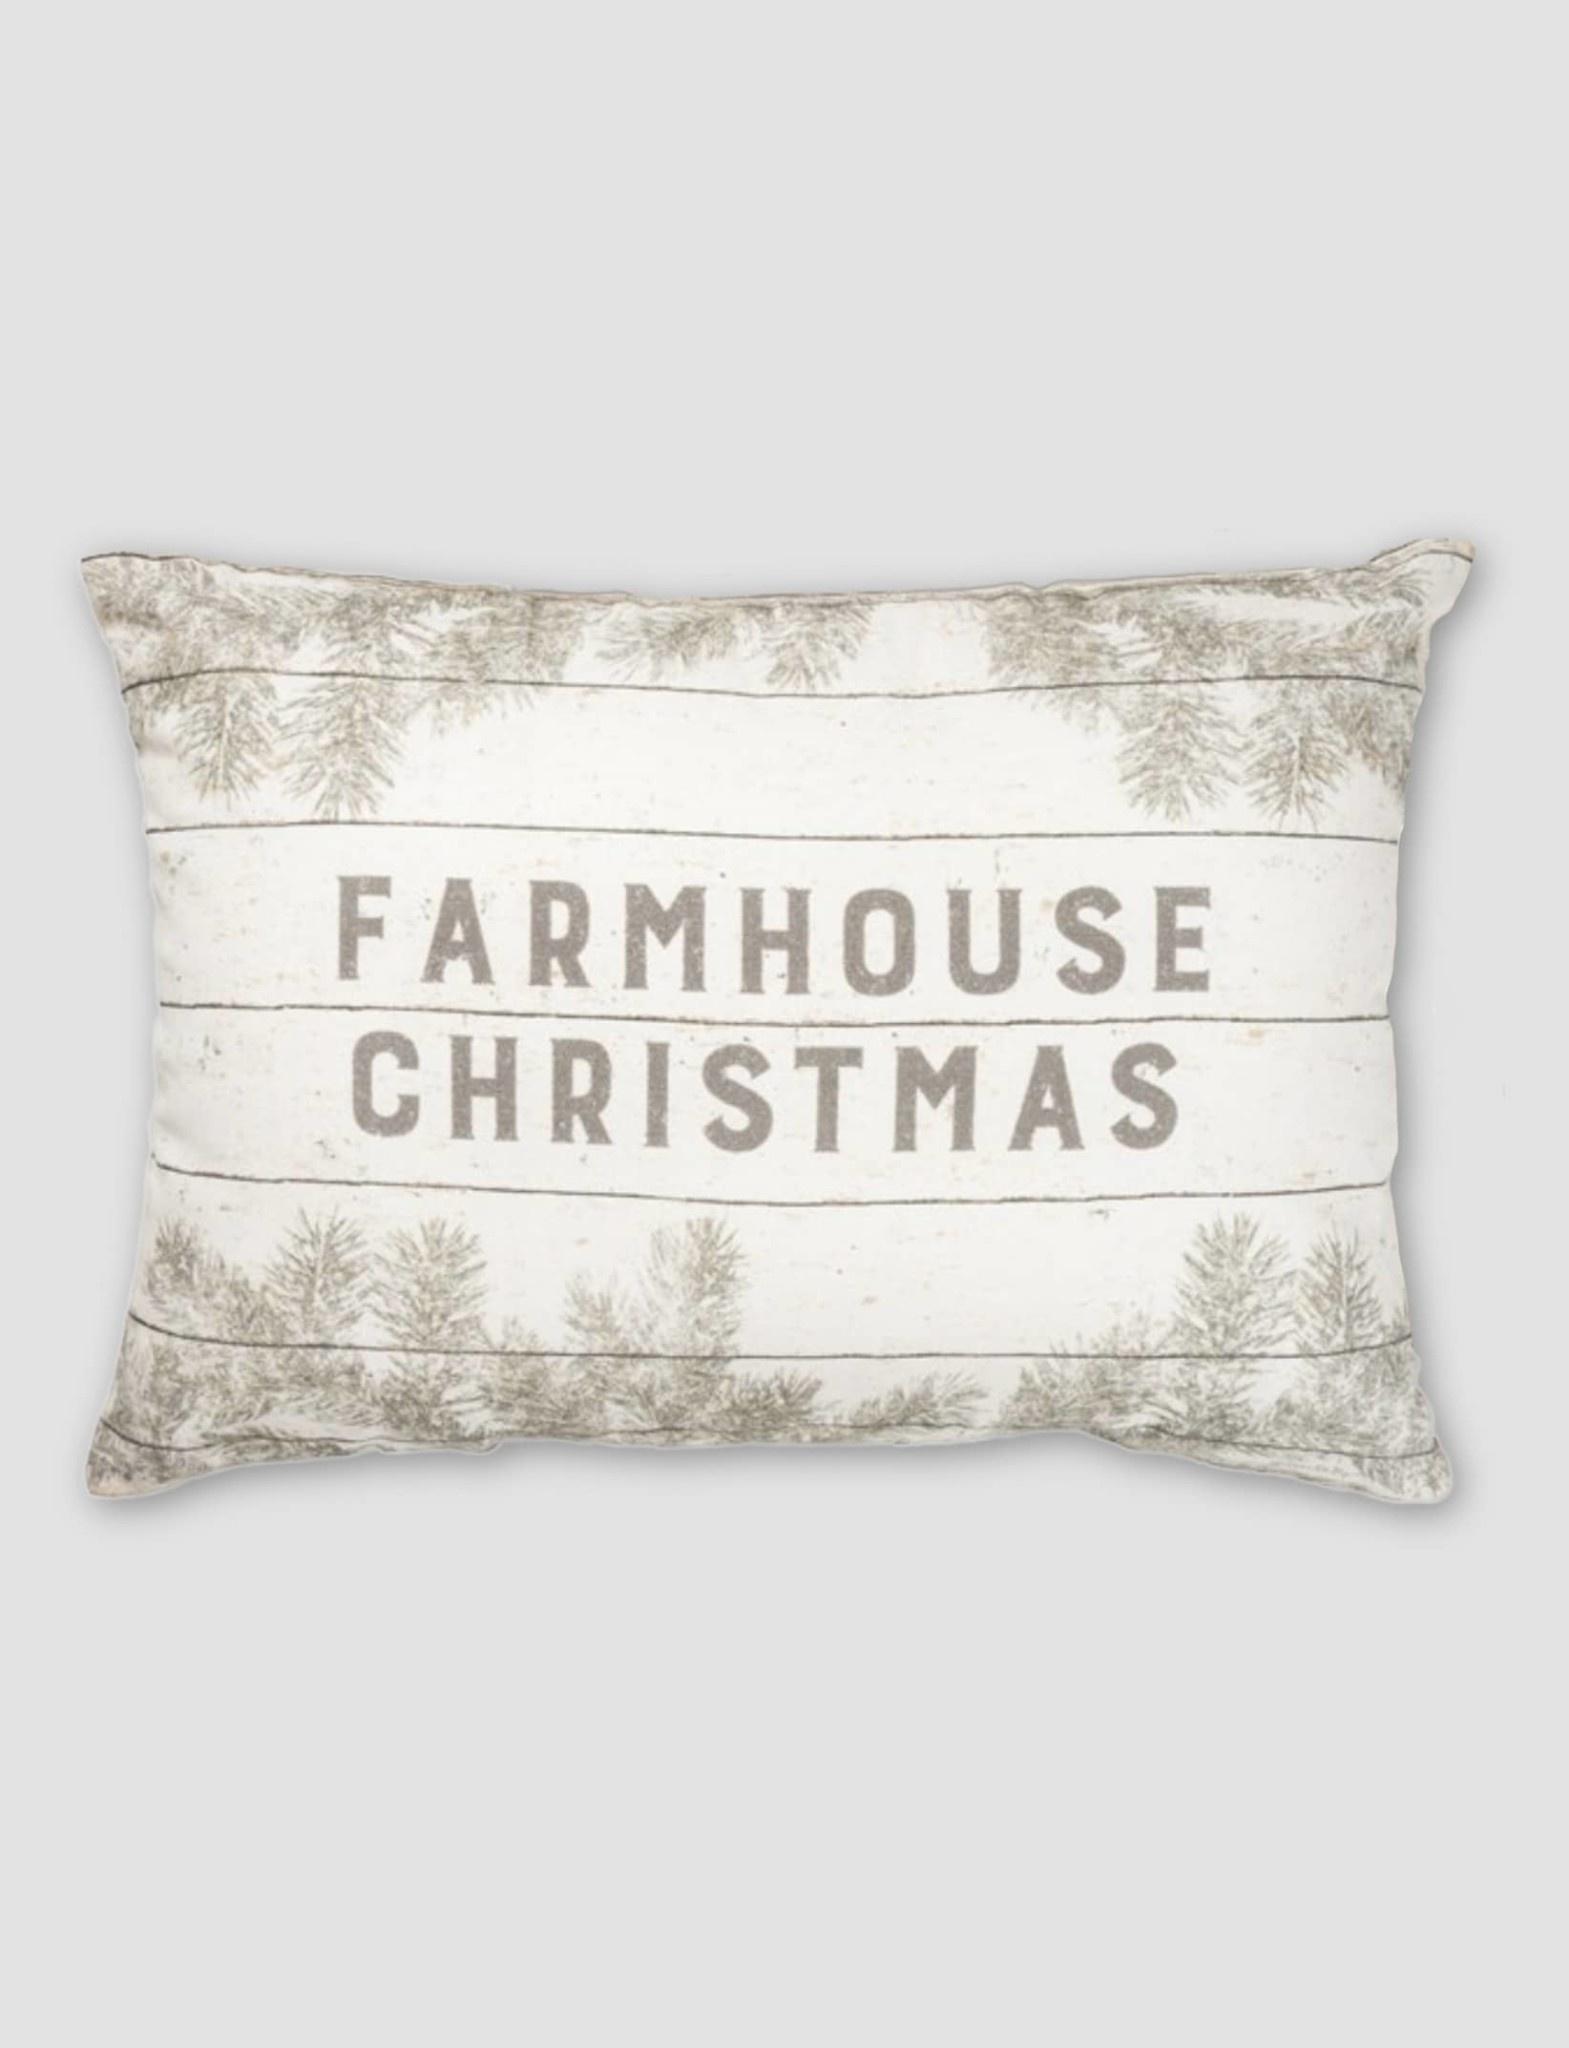 Nana's Farmhouse Farmhouse Christmas Pillow